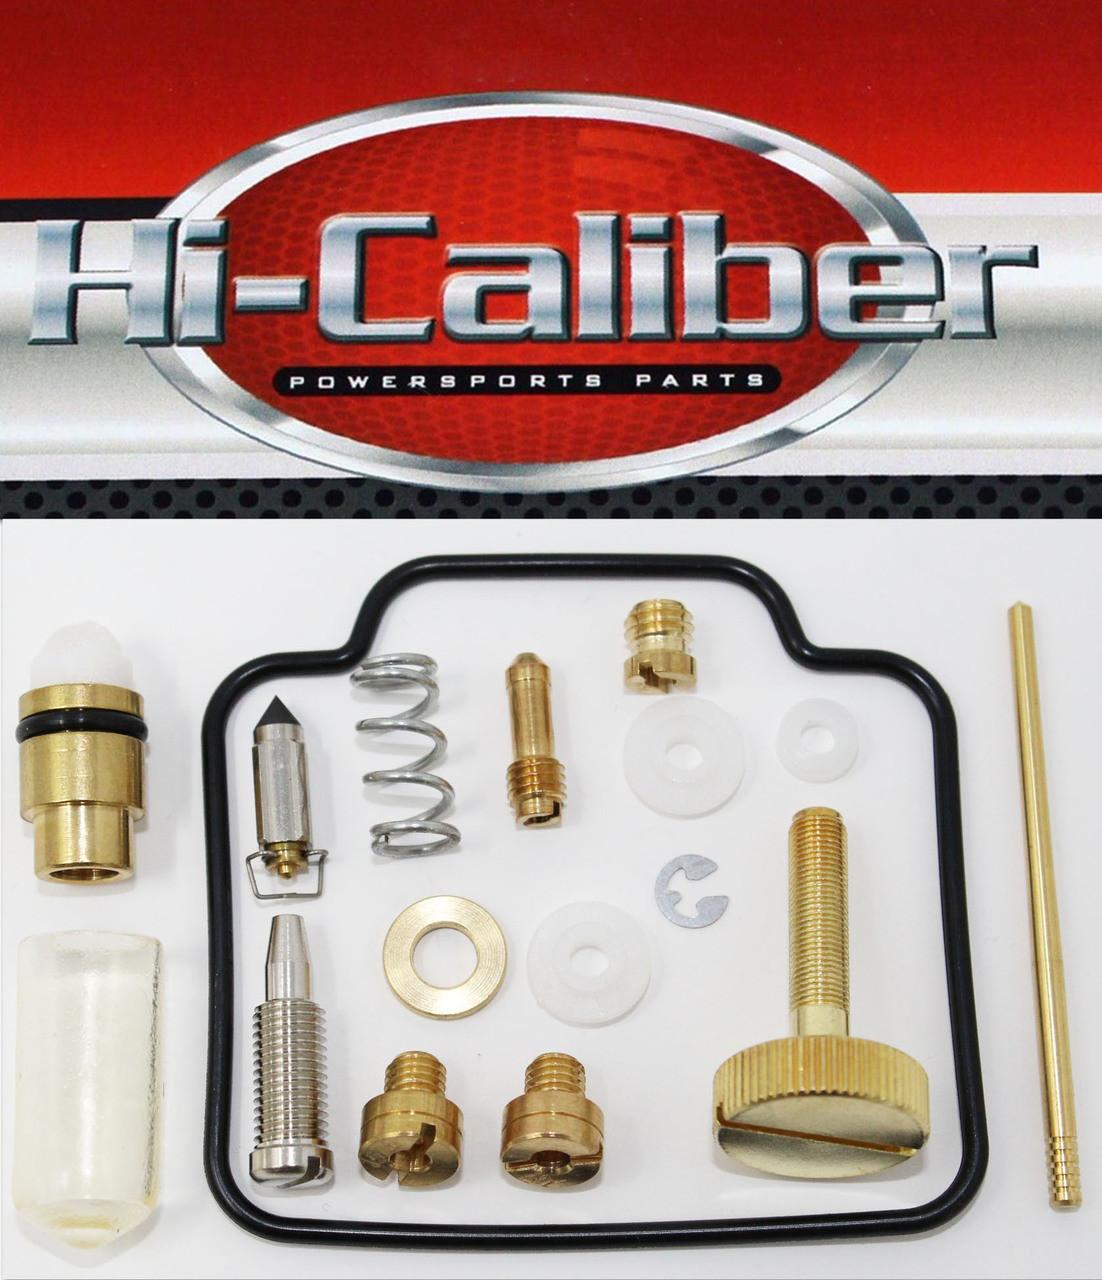 OEM QUALITY Carburetor Rebuild Carb Kit for 2003-2005 Polaris 400 Sportsman ATVs